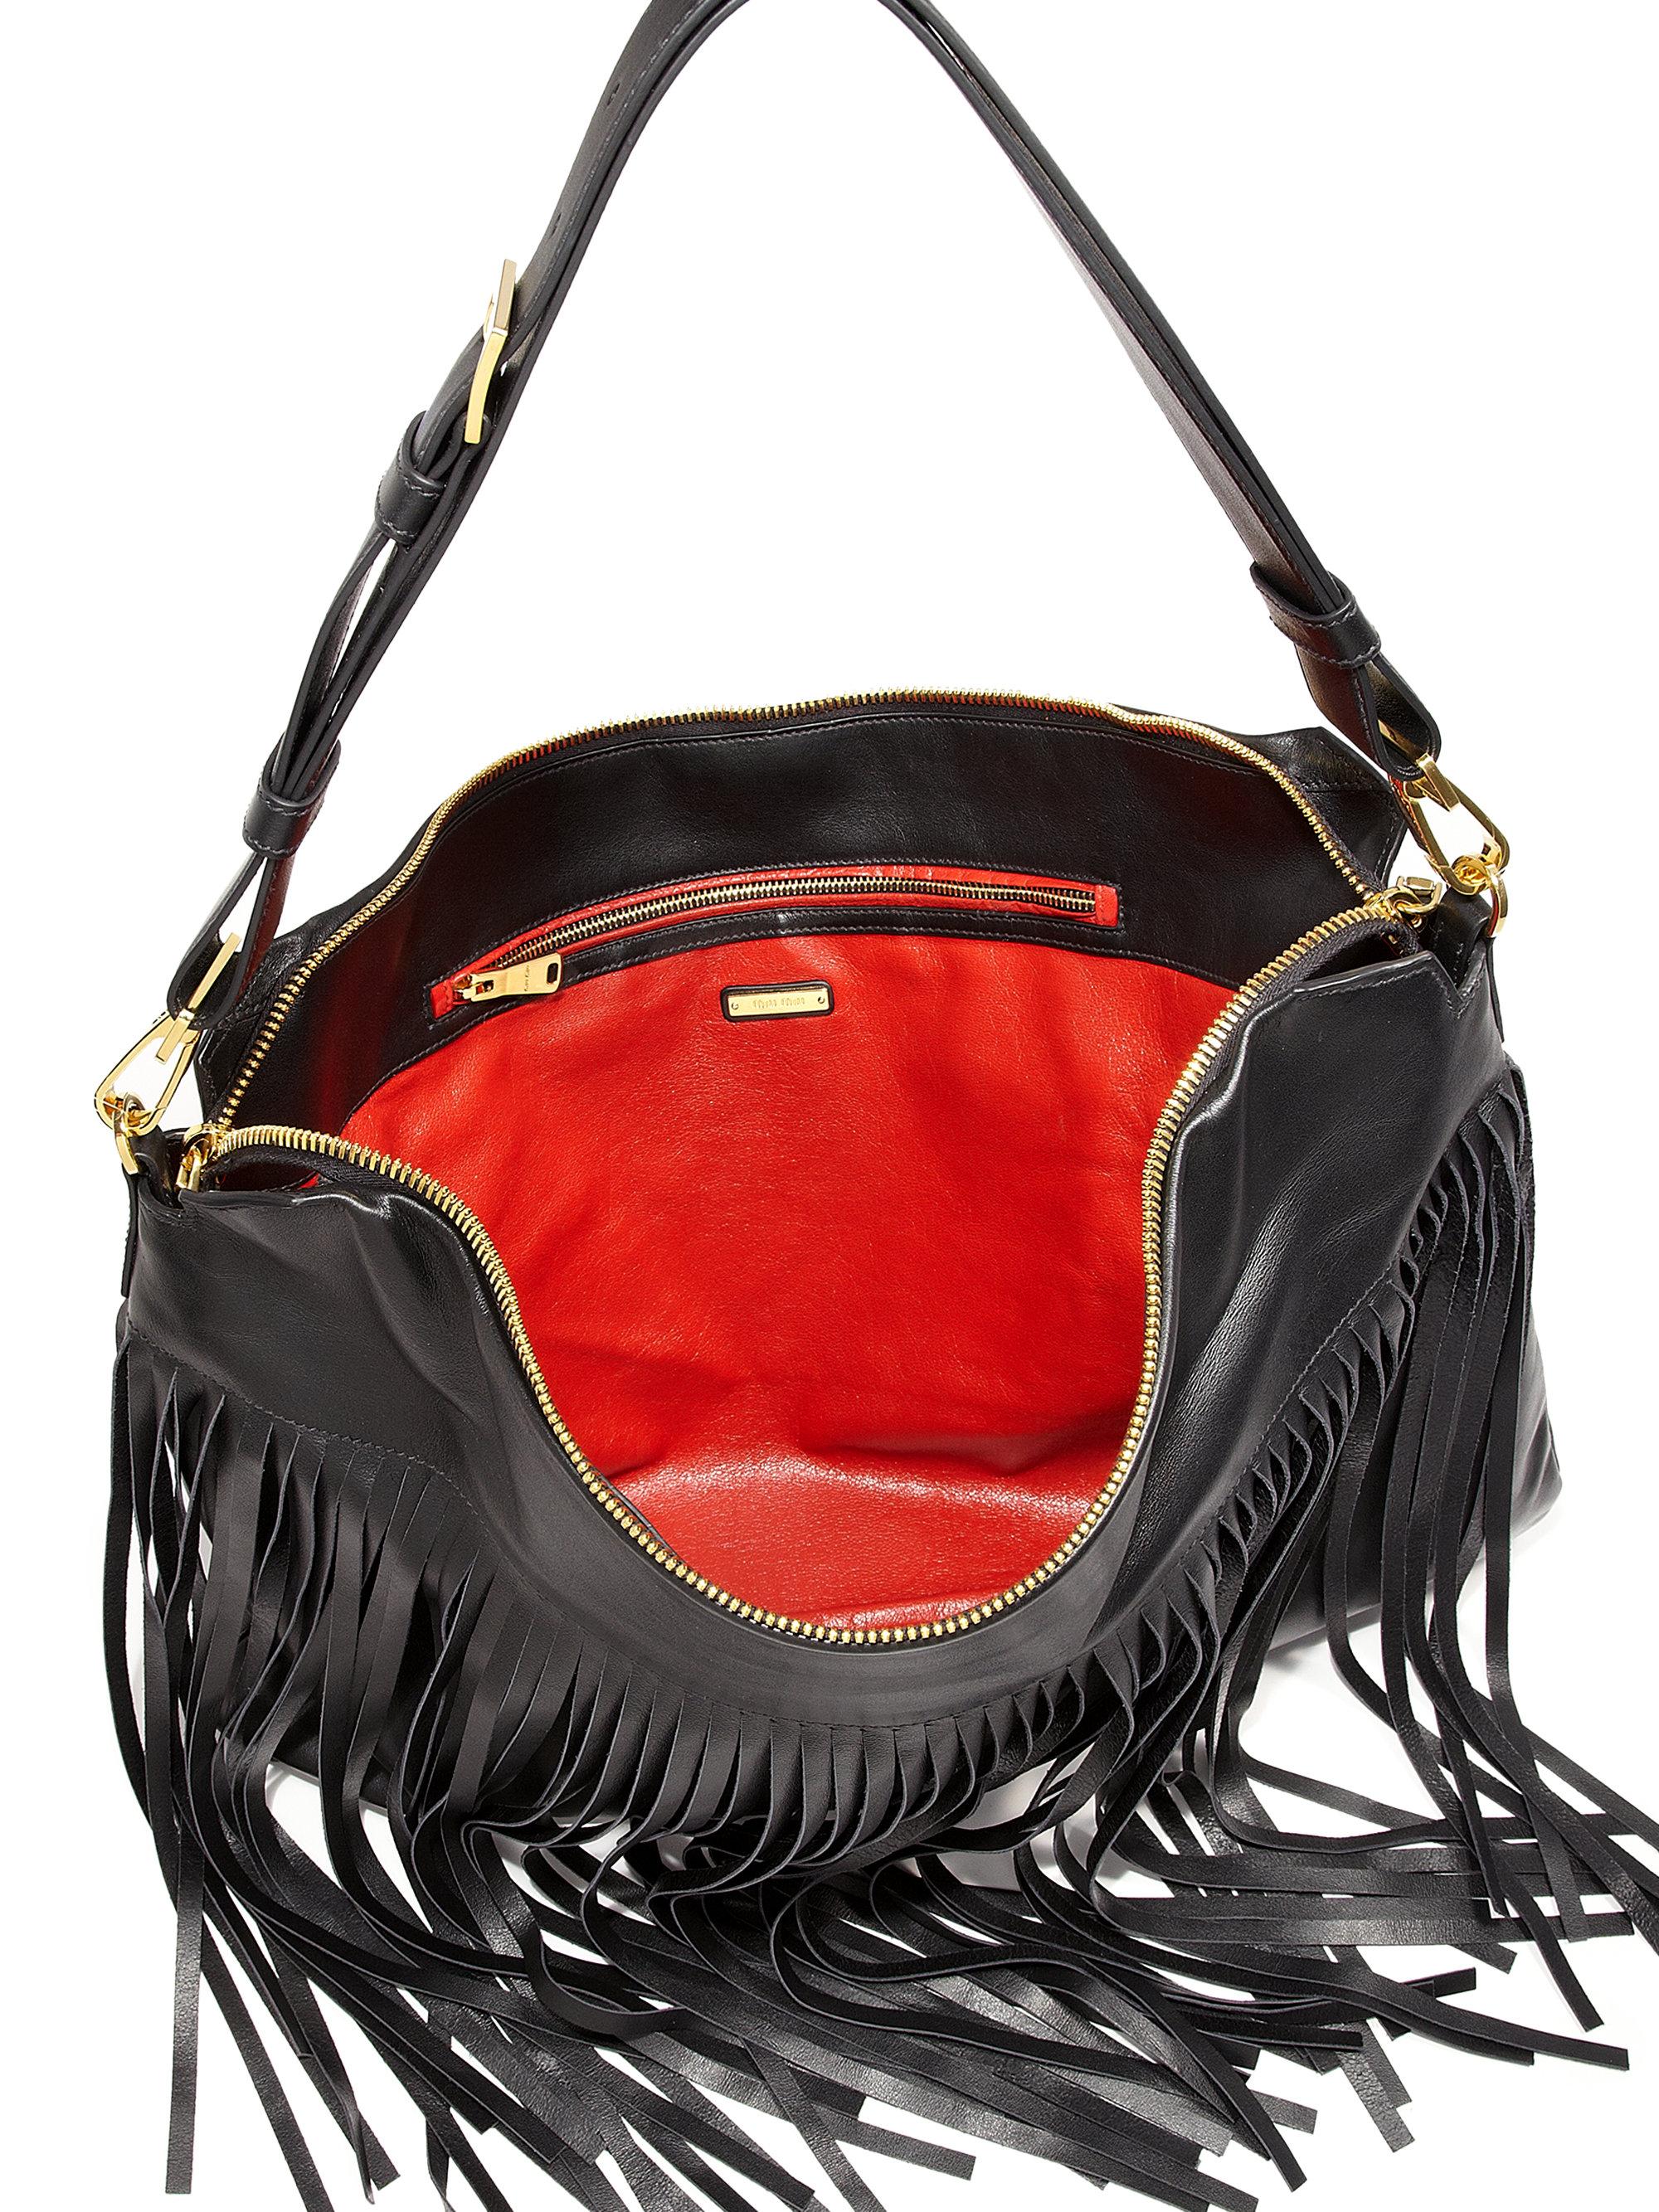 d979afbea27c Lyst - Miu Miu Fringed Hobo Bag in Black